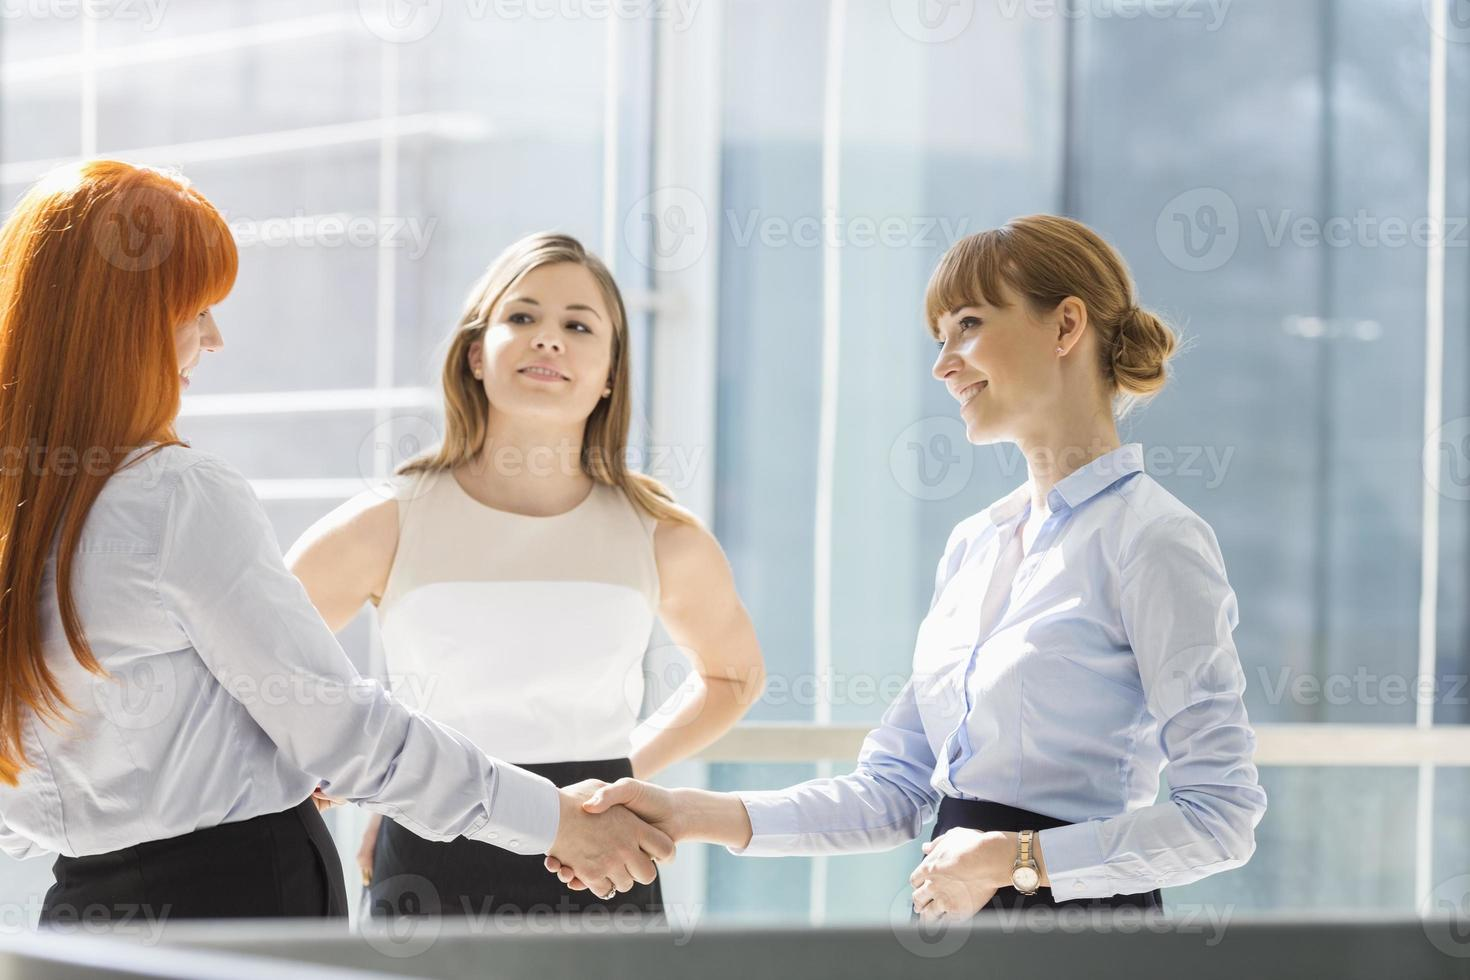 Women in Business photo